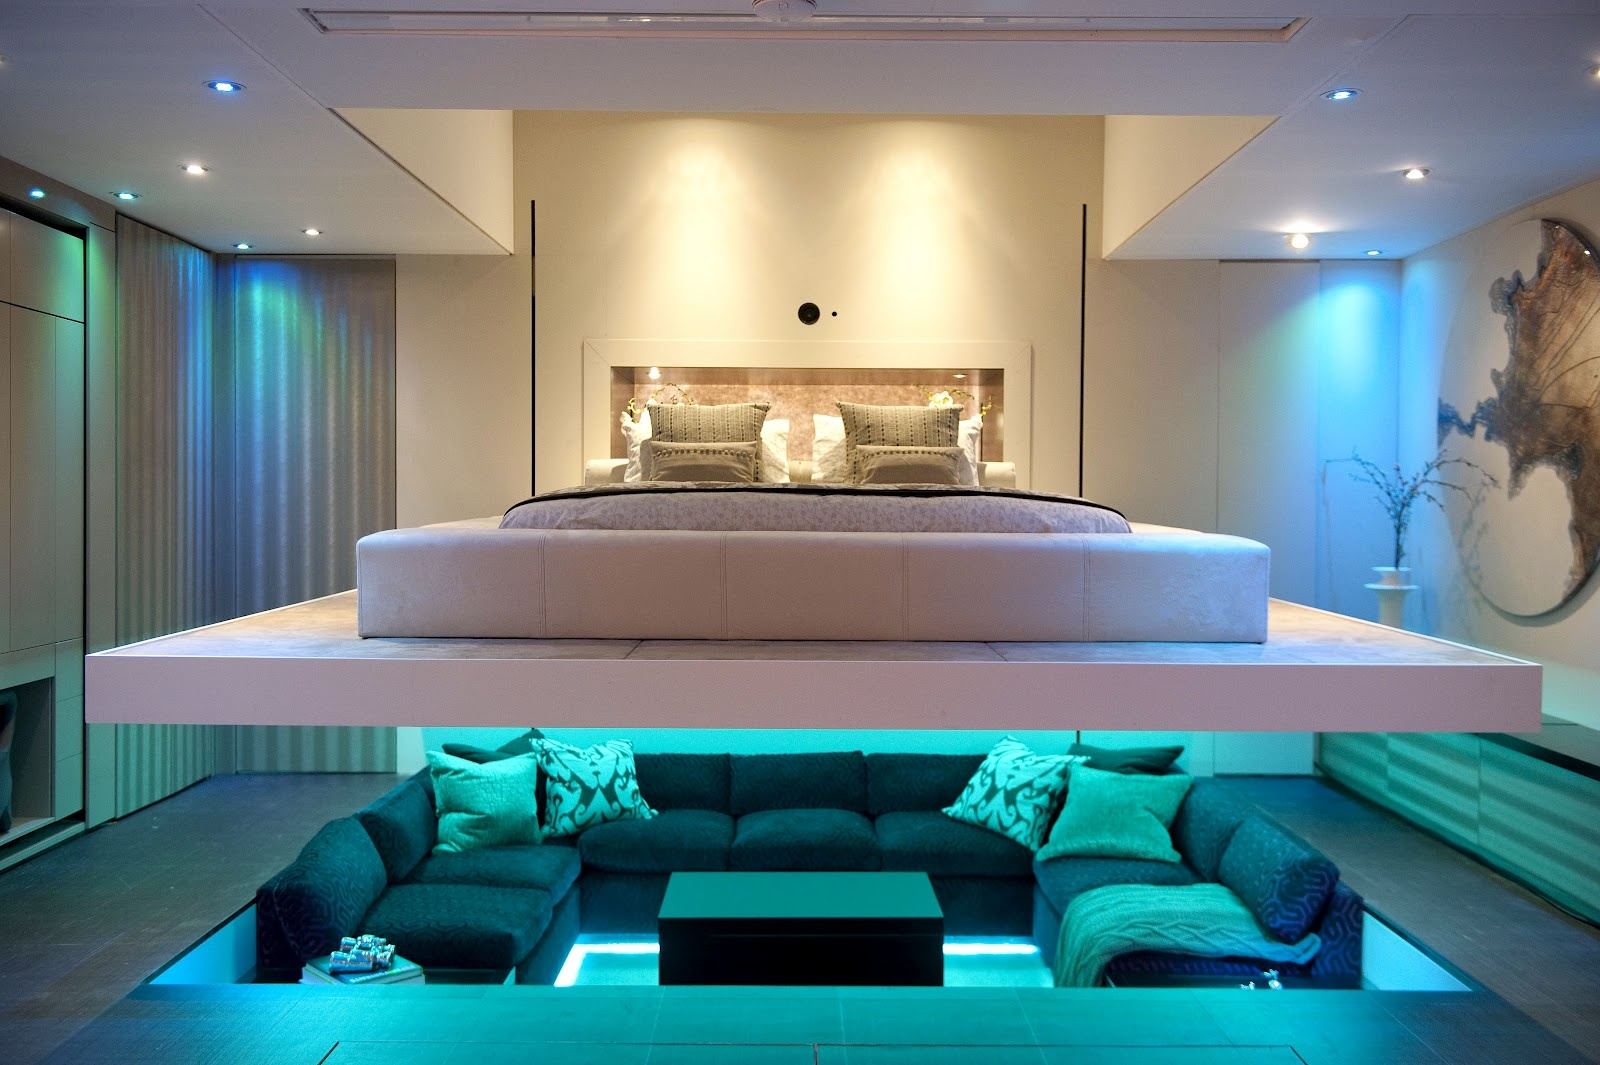 wonderful-sunken-seat-area-with-rug-area-on-bottom-with-bluish-light-on-modern-apartment